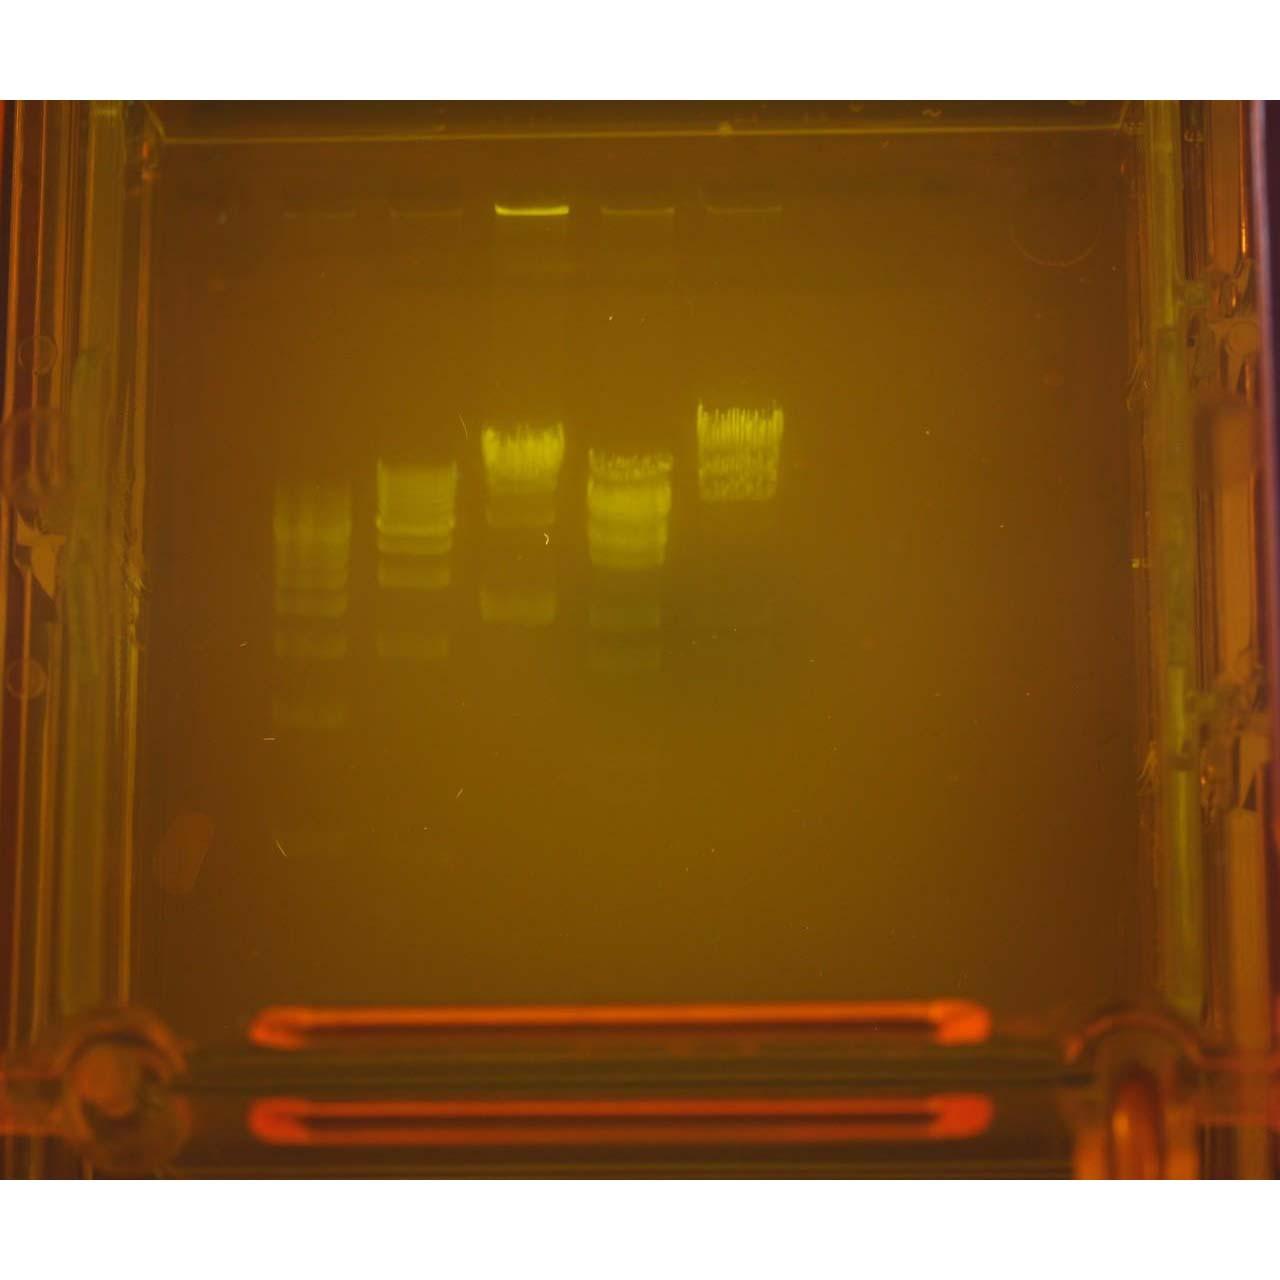 G40.04 - blueGel Electrophoresis with built-in illuminator